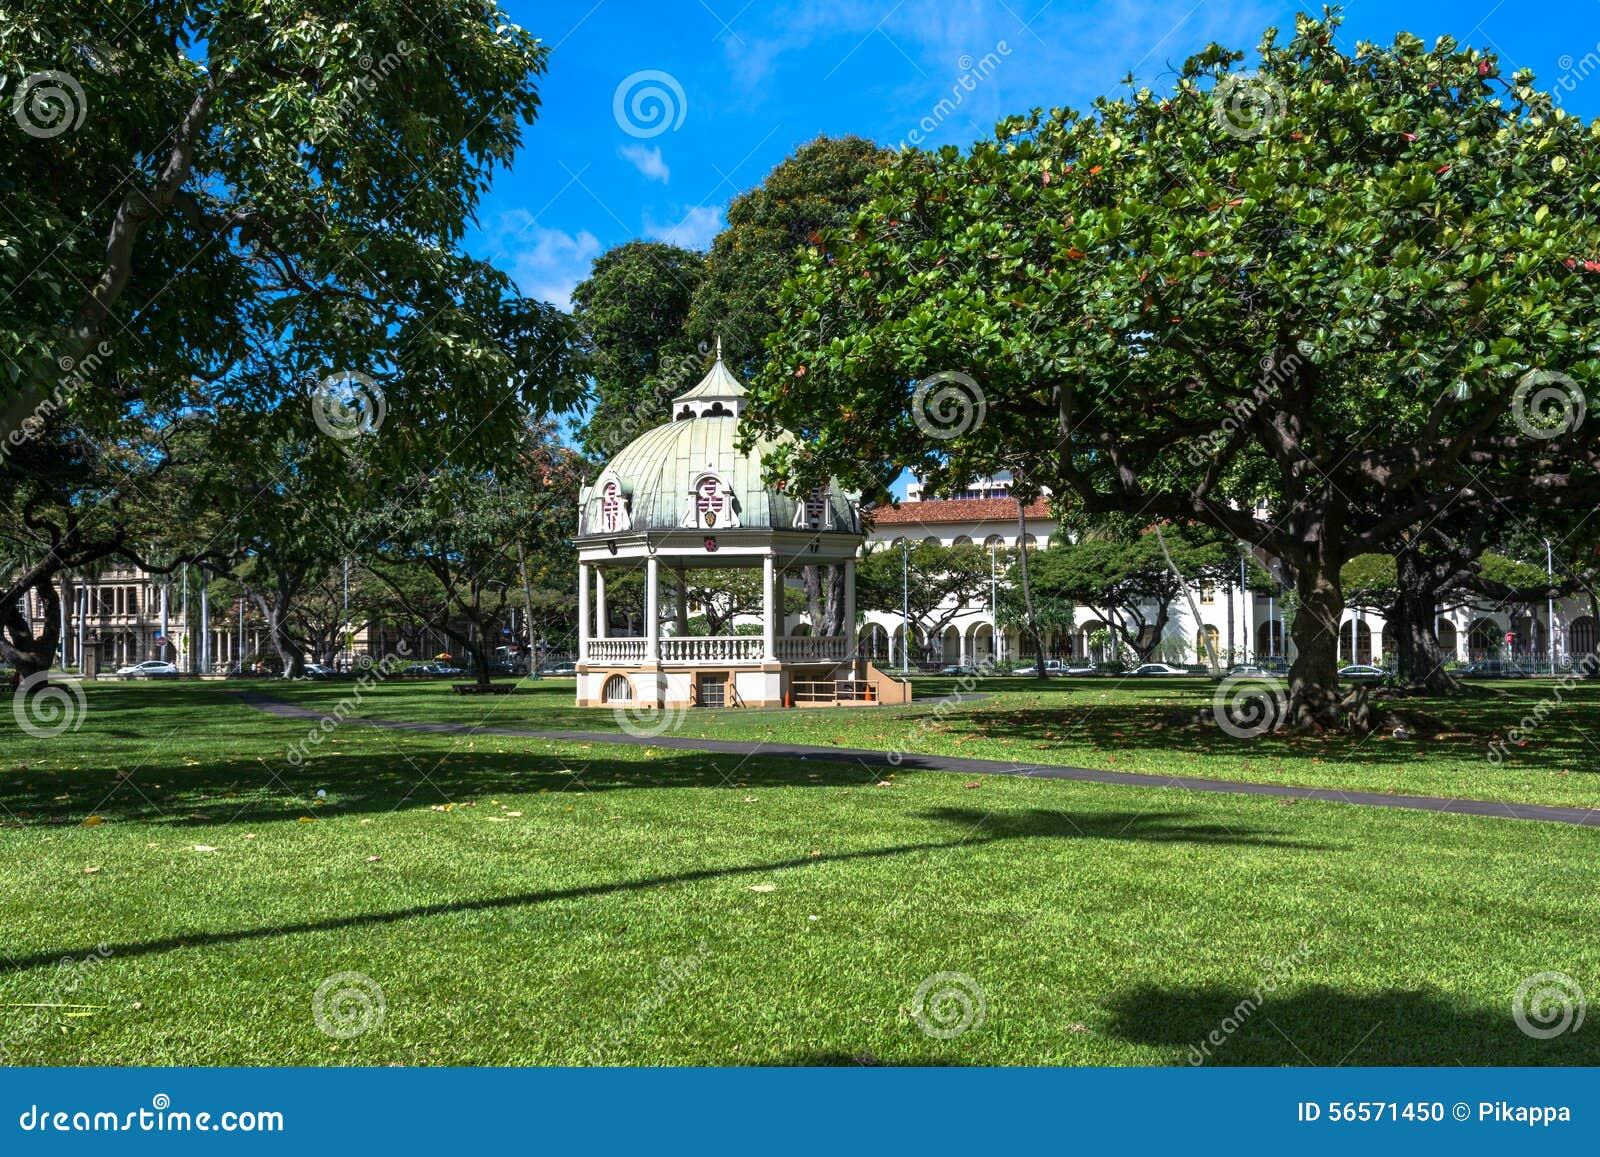 Download Coronation περίπτερο, Χονολουλού, Χαβάη Εκδοτική εικόνα - εικόνα από coronation, περίπτερο: 56571450